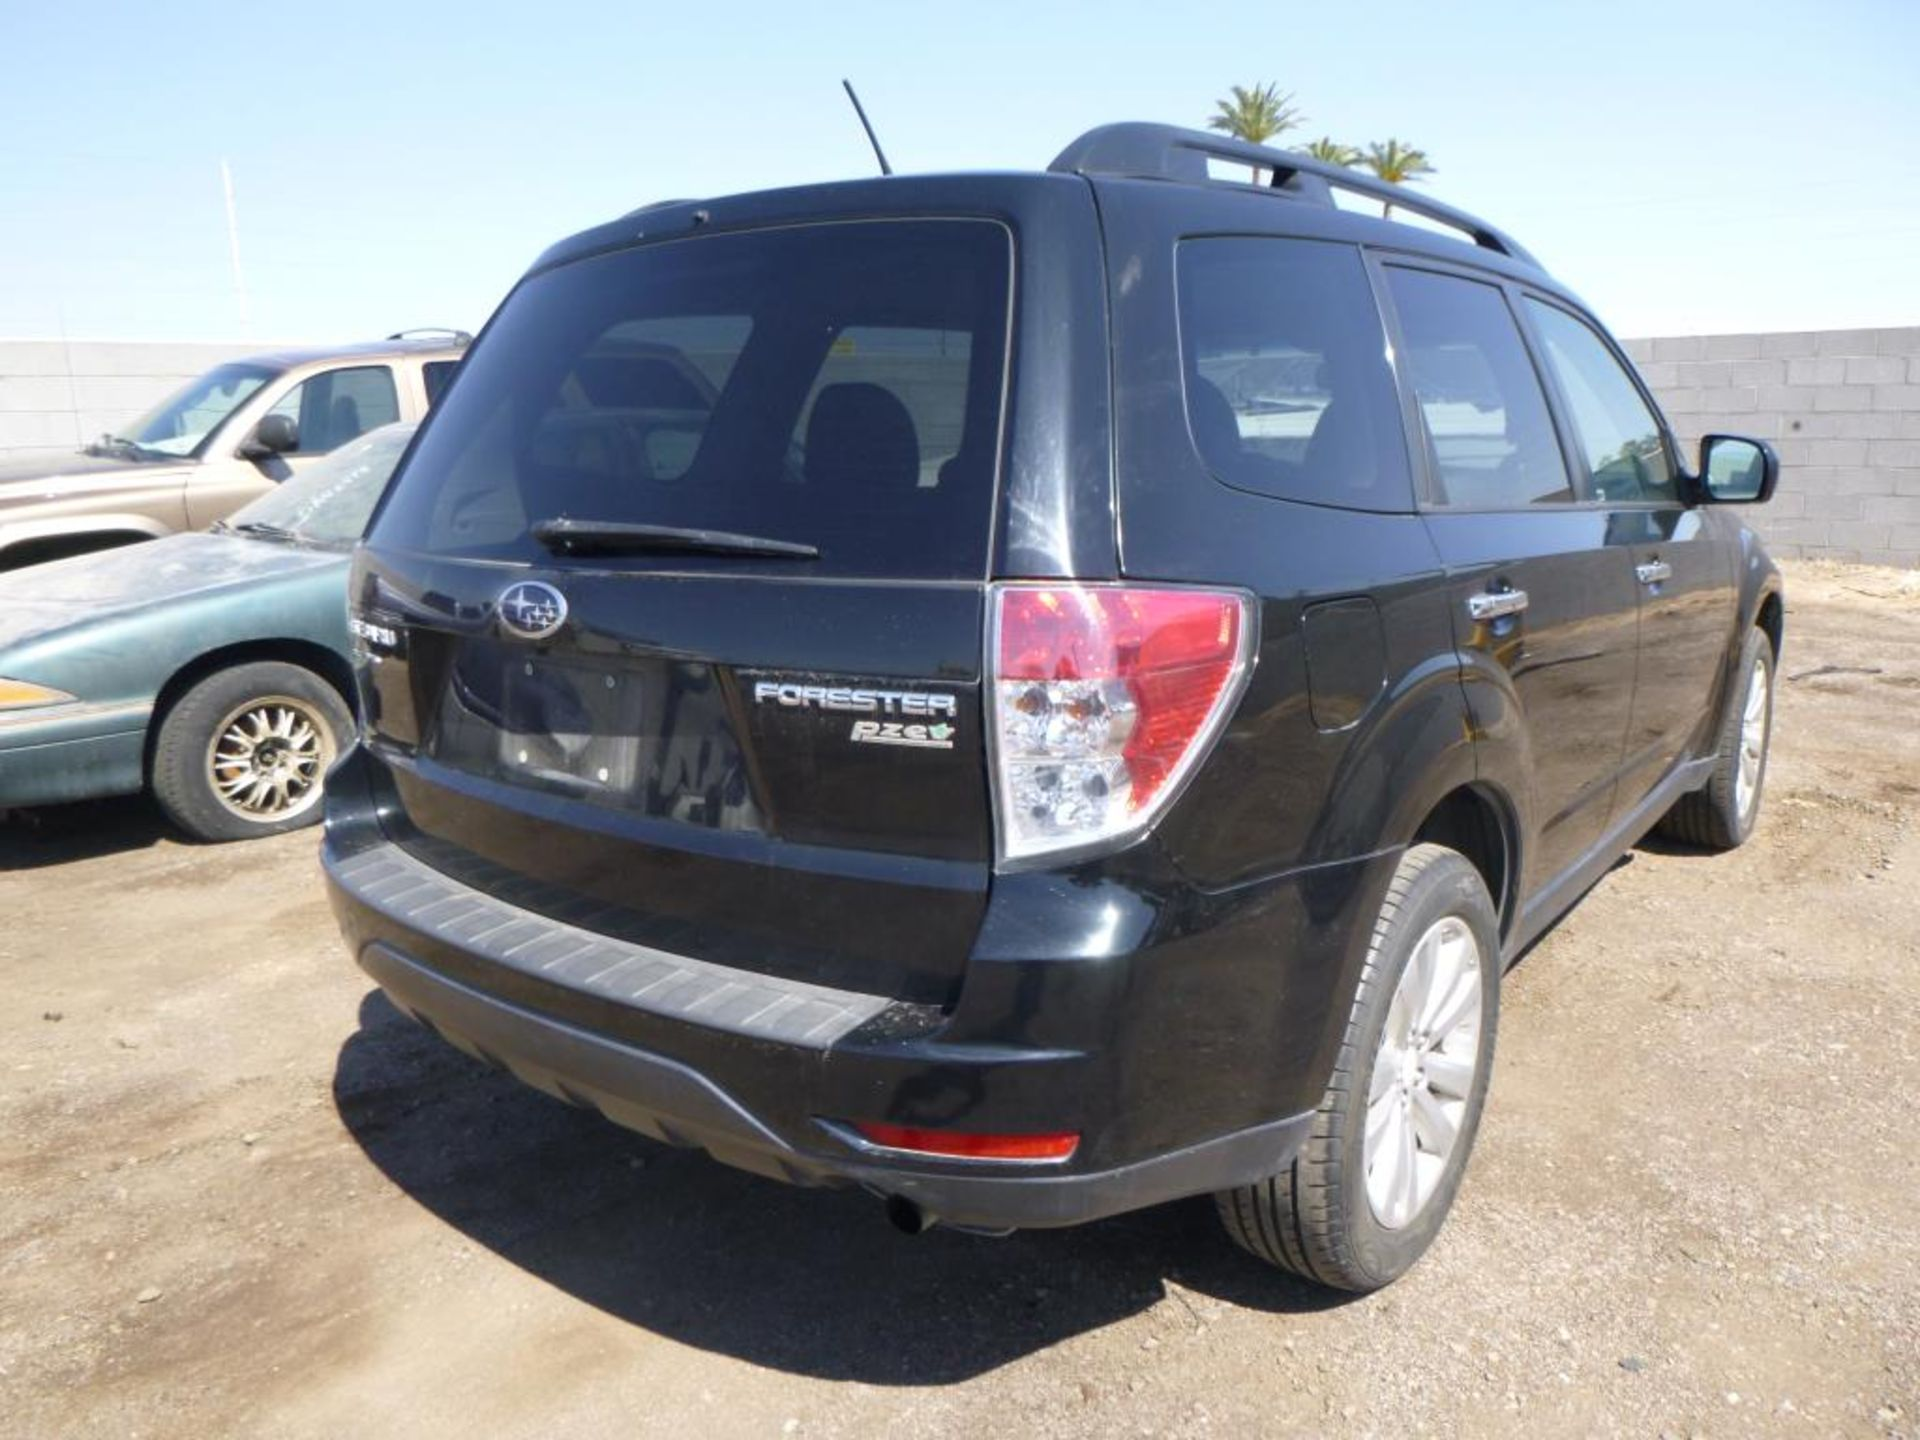 2011 Subaru Forester - Image 4 of 11